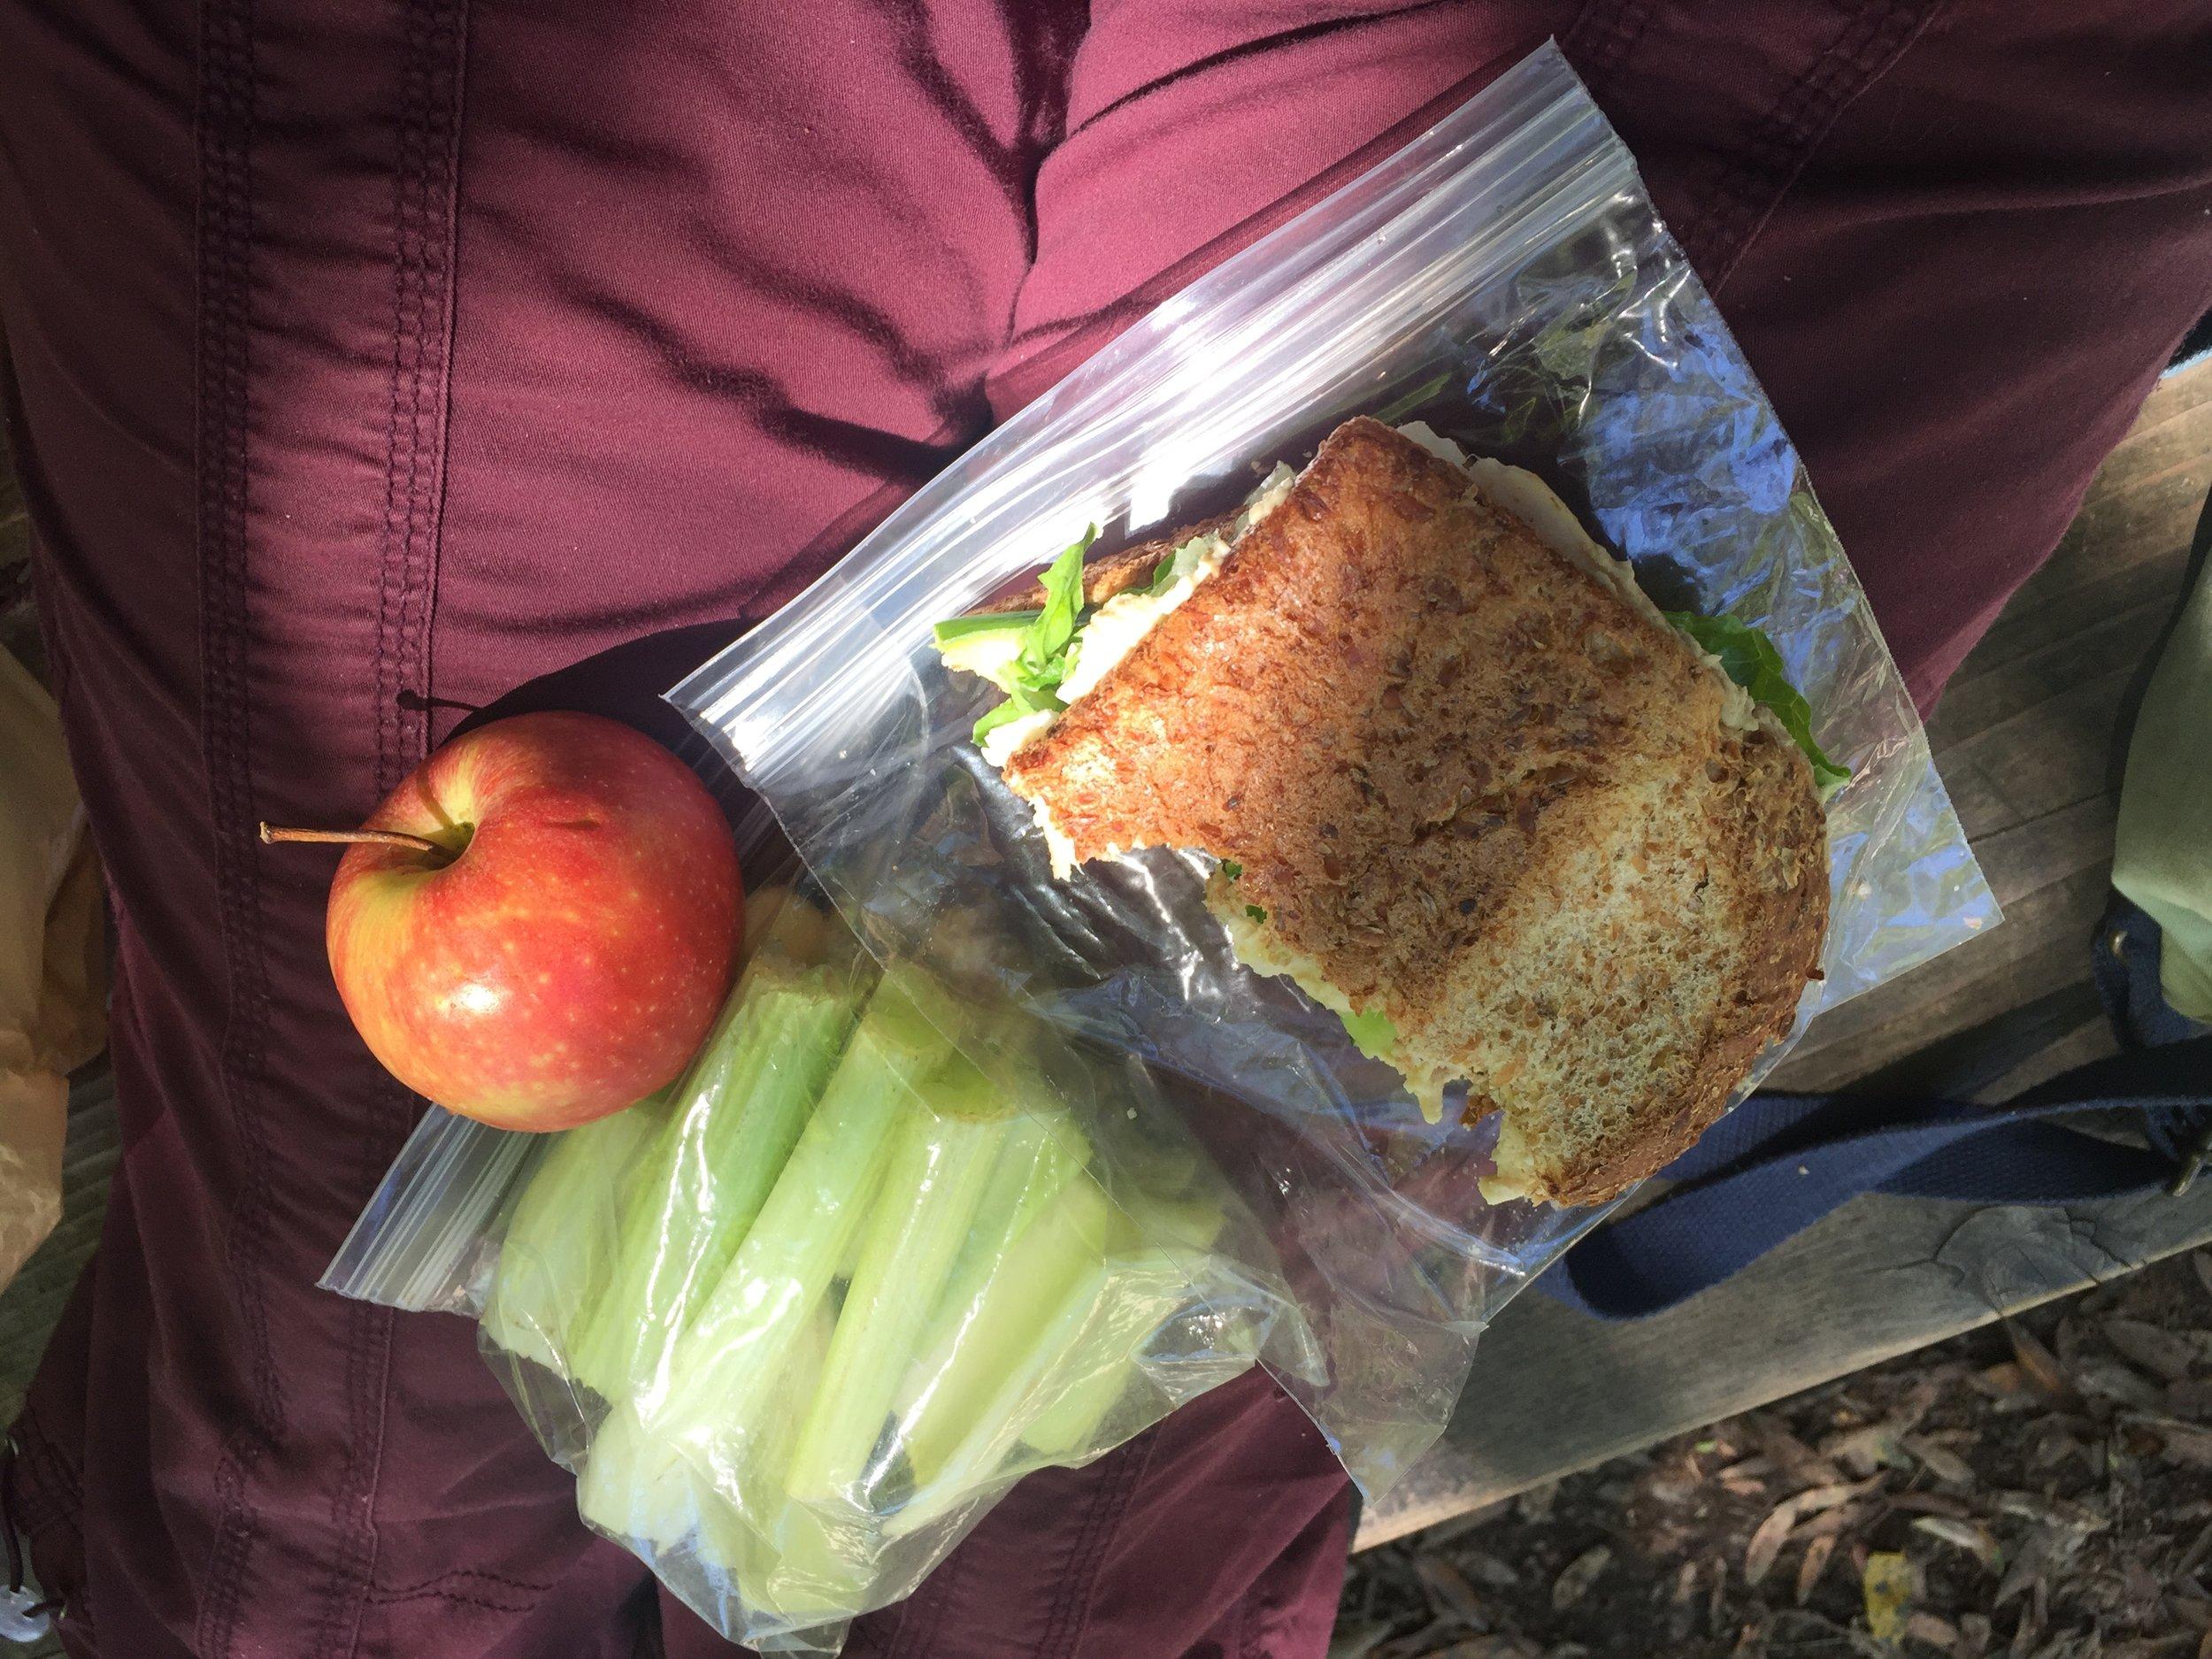 Pre-hiking lunch at John Muir Woods, California